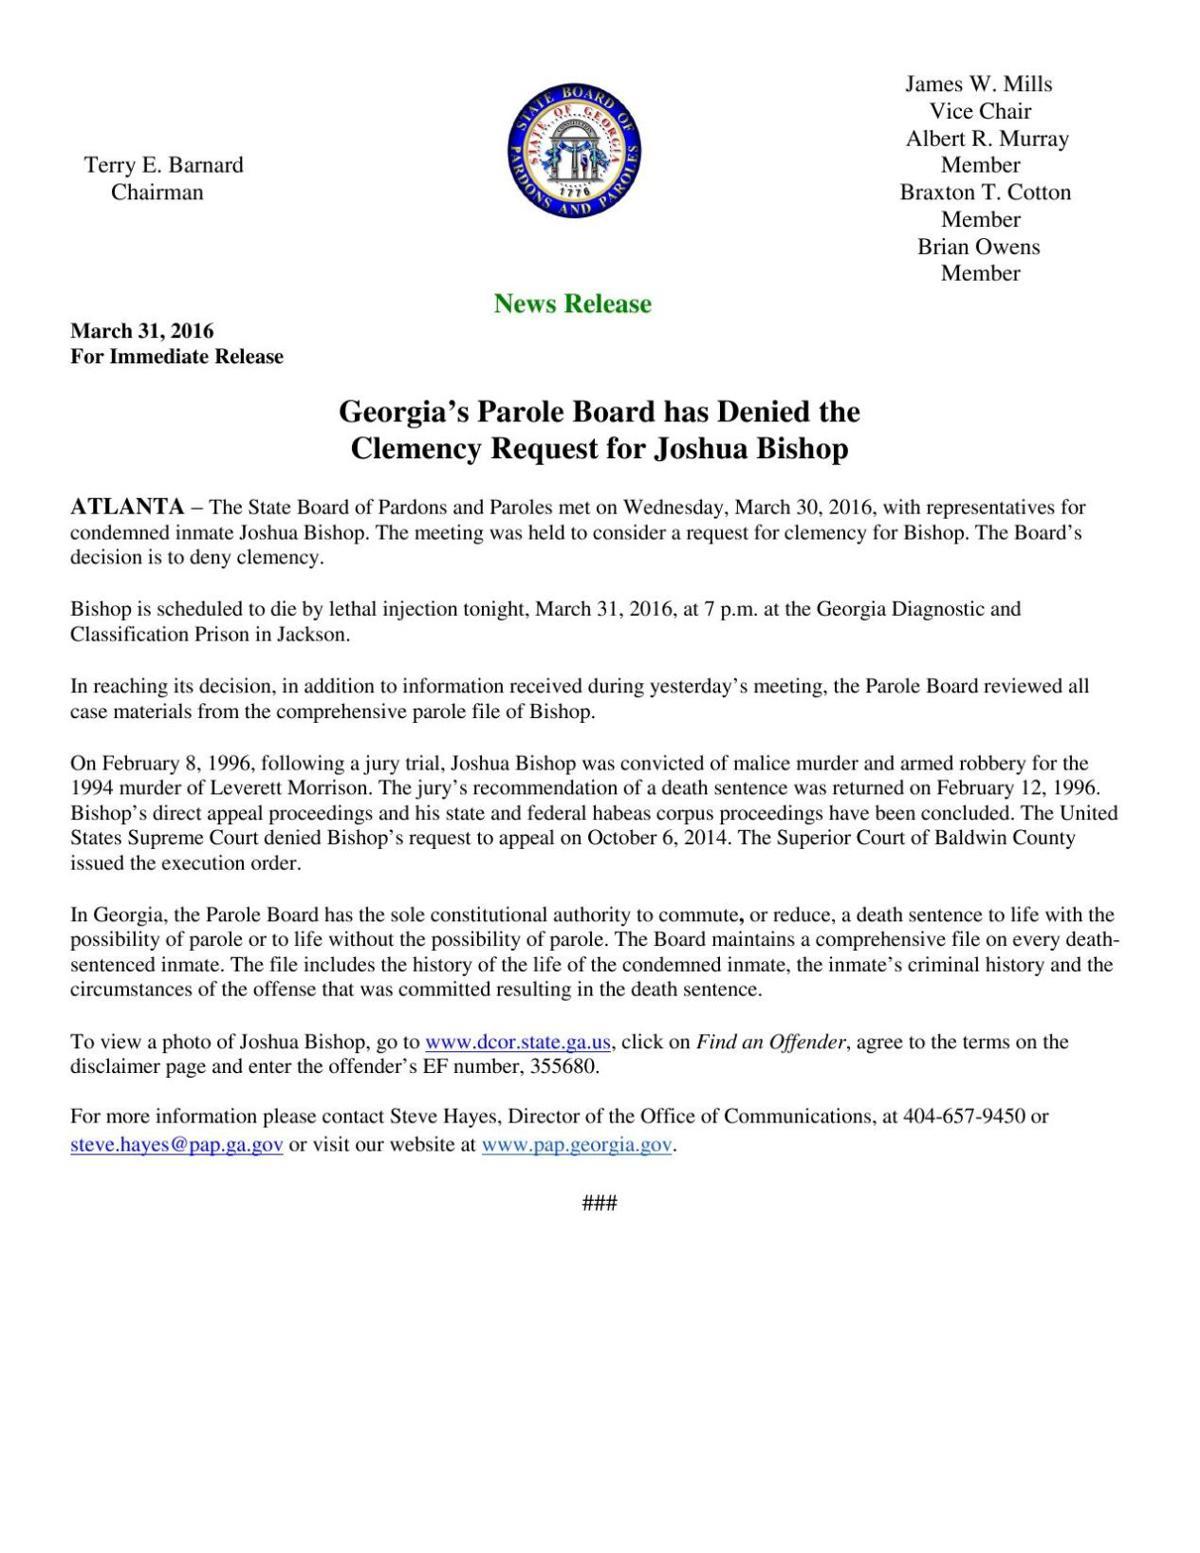 Bishop clemency announcement | Local News | unionrecorder com